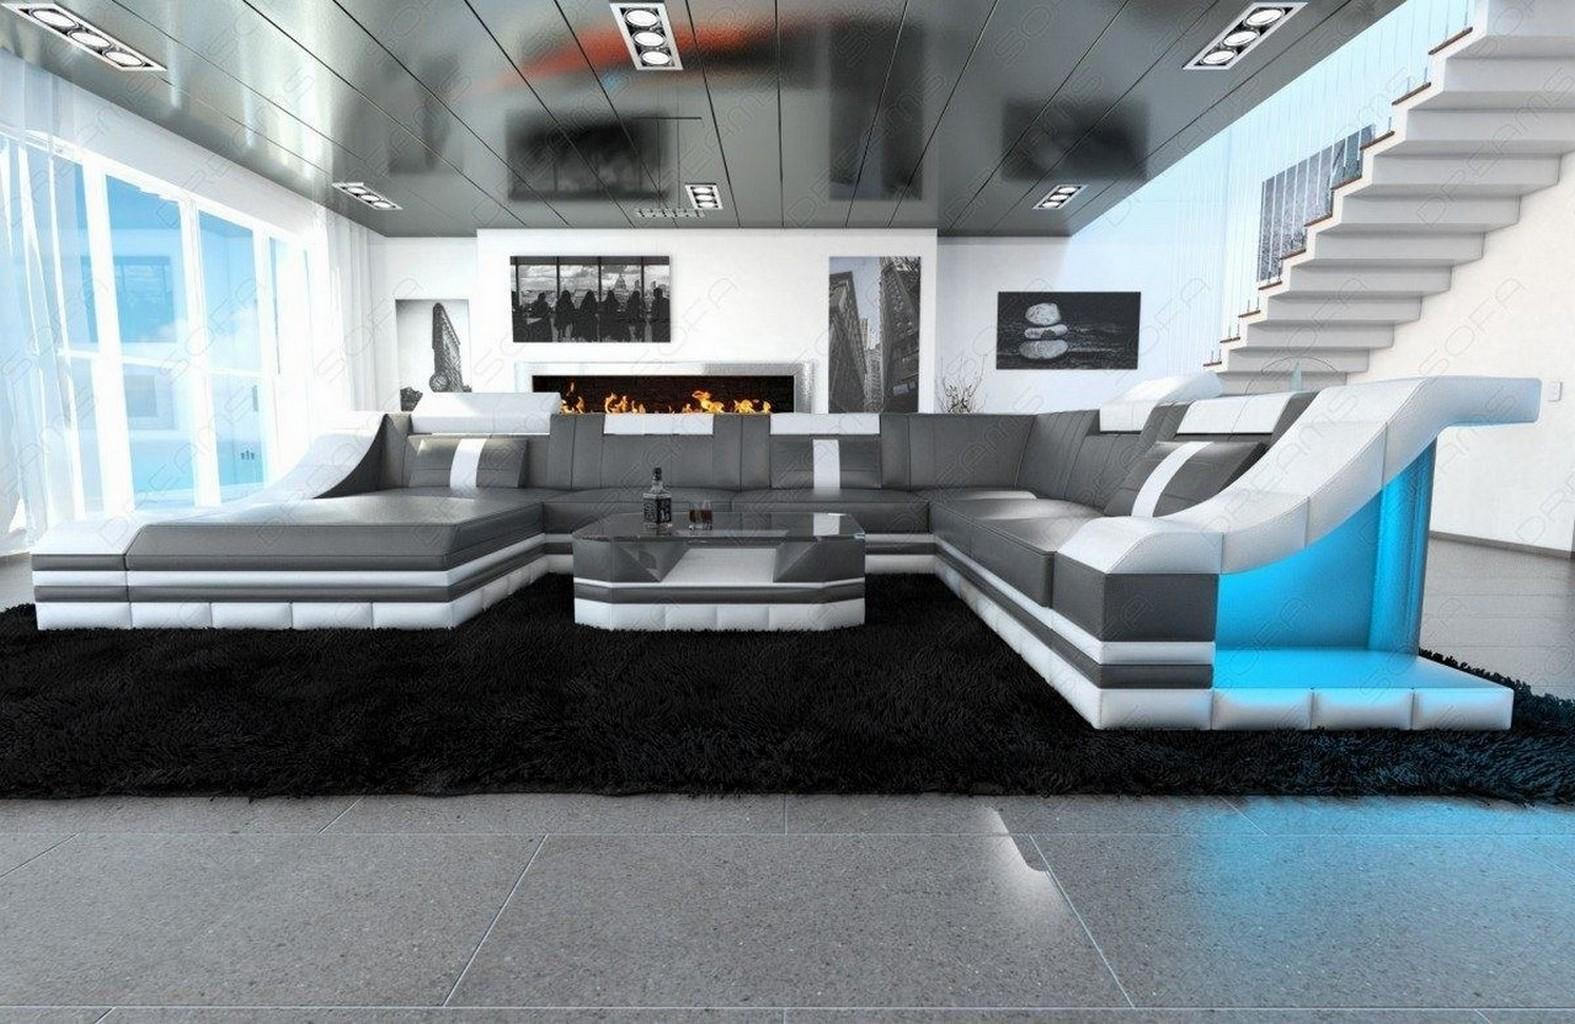 residential landscape turino xl with led lighting sofa. Black Bedroom Furniture Sets. Home Design Ideas